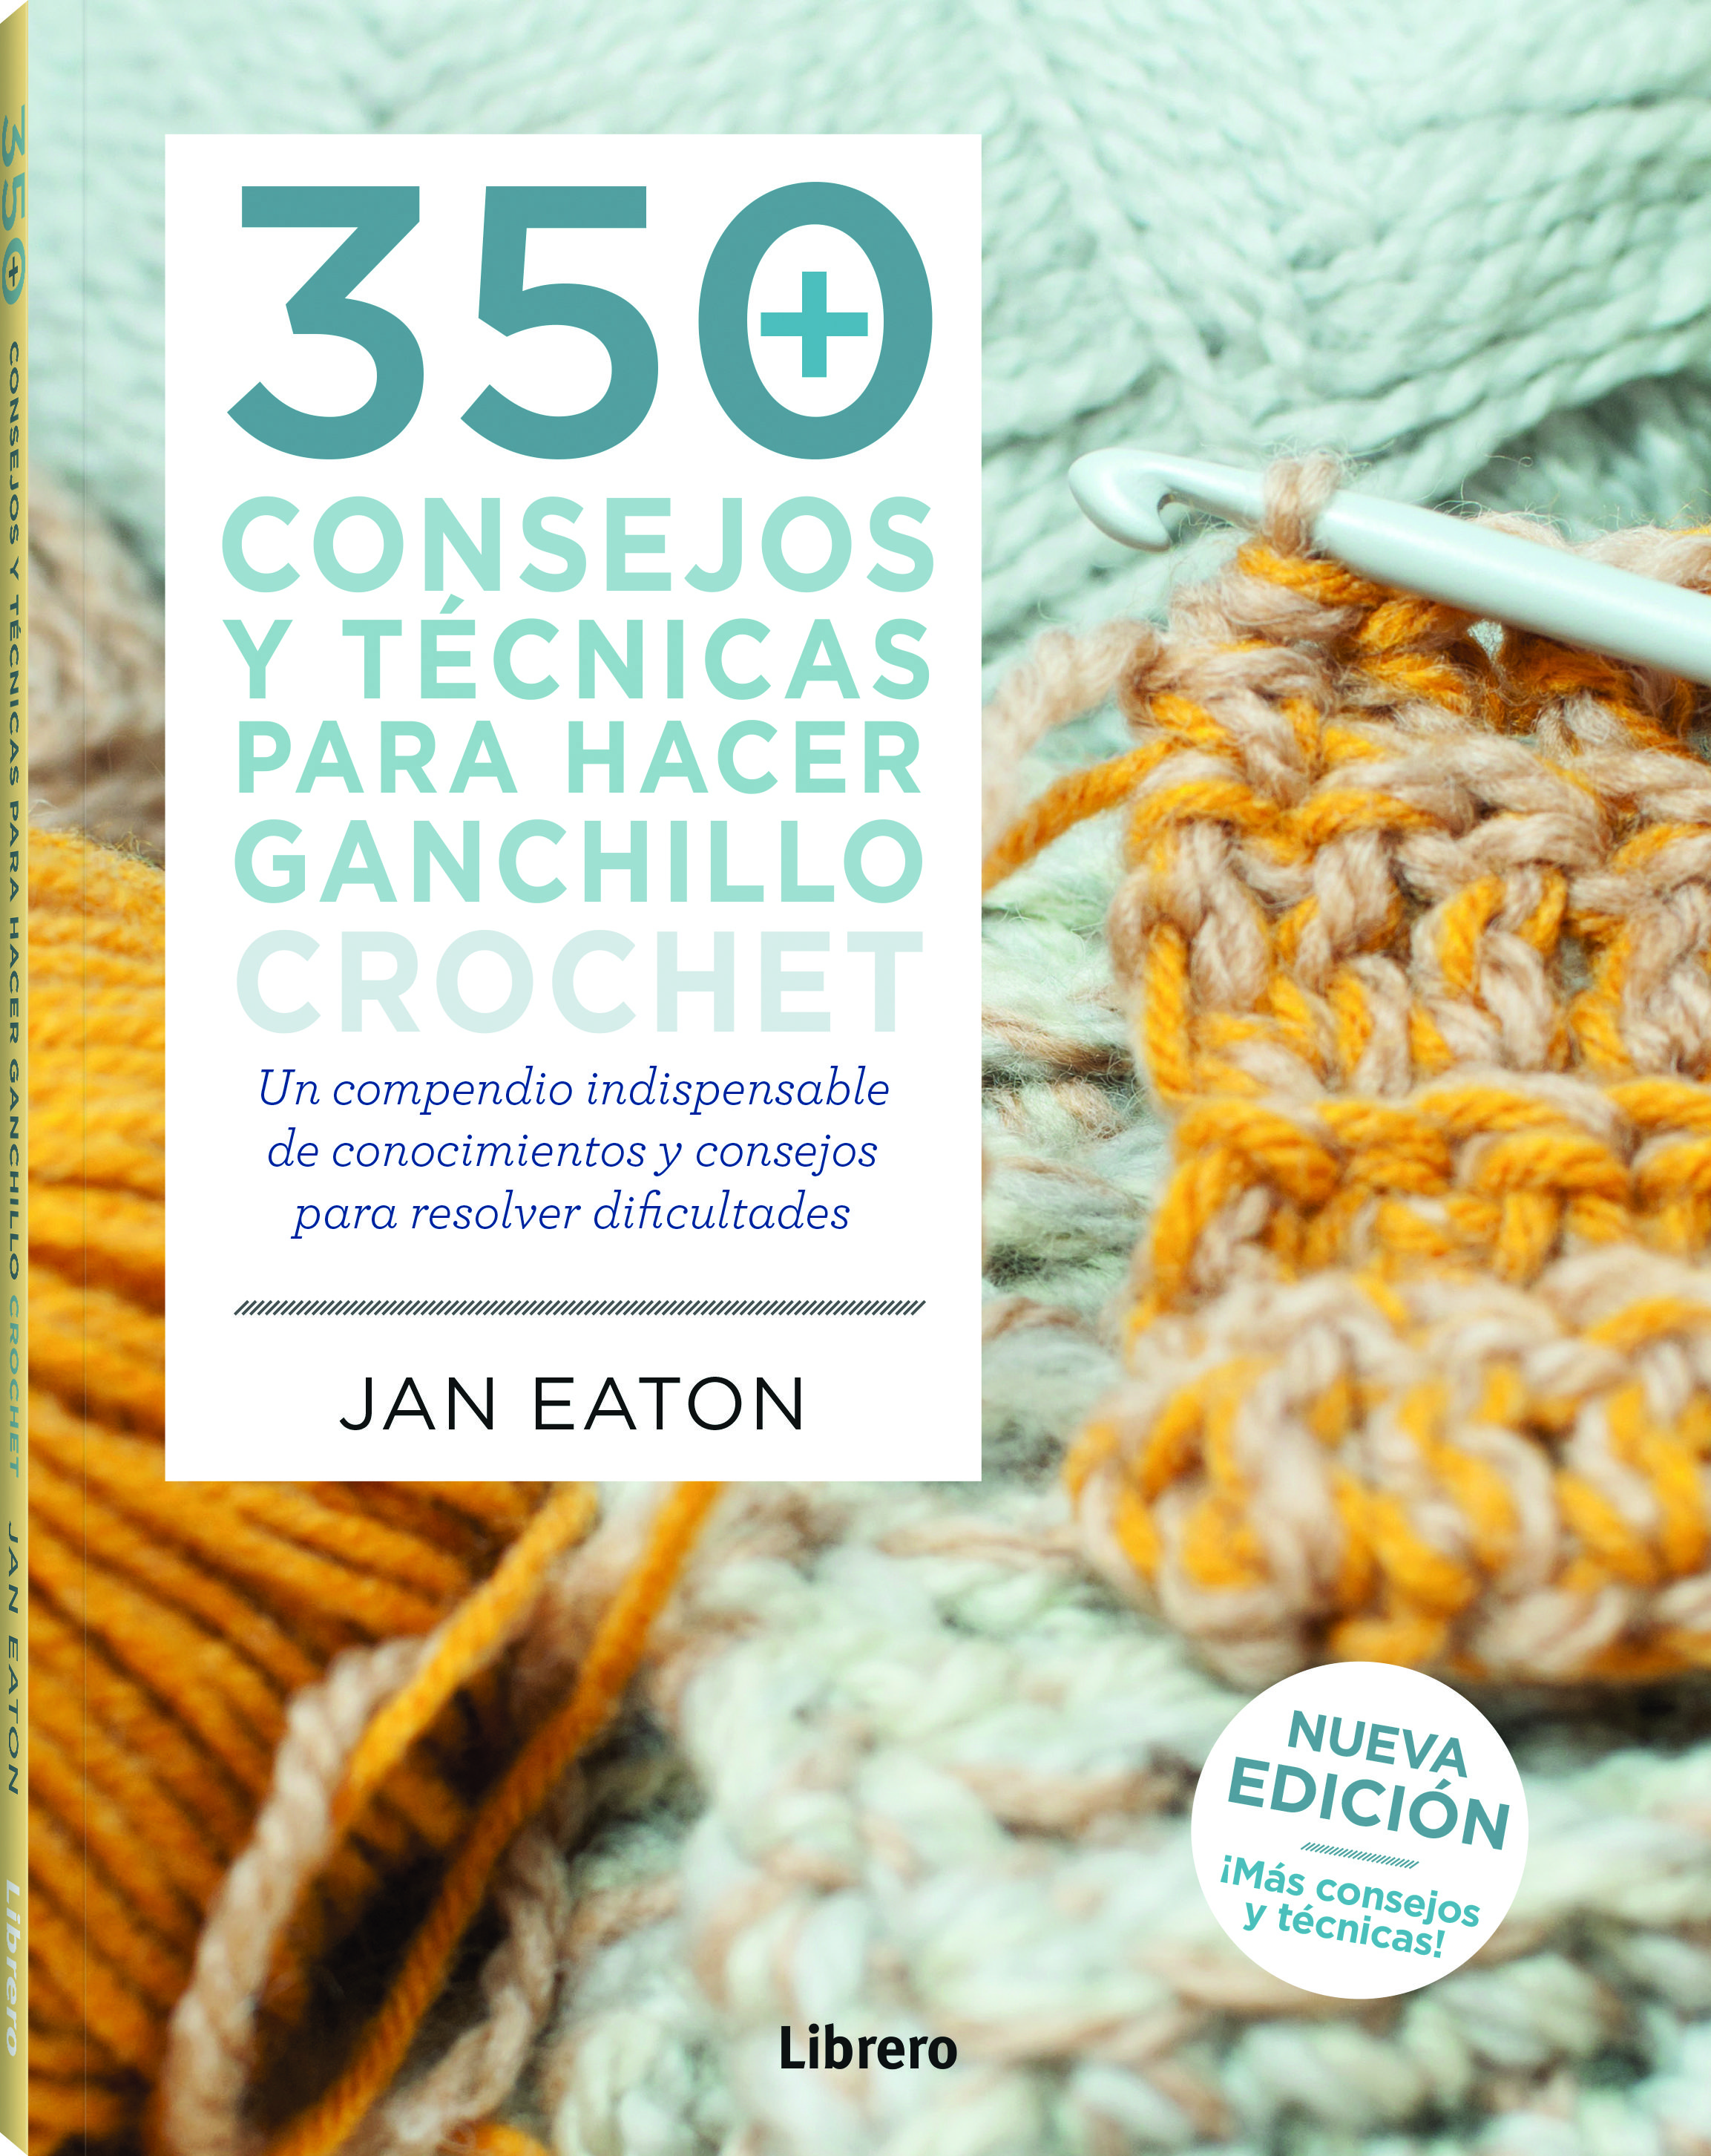 350 consejos y ténicas para hacer ganchillo ( crochet)-eatonjeremy, jean harwood-9789463590464